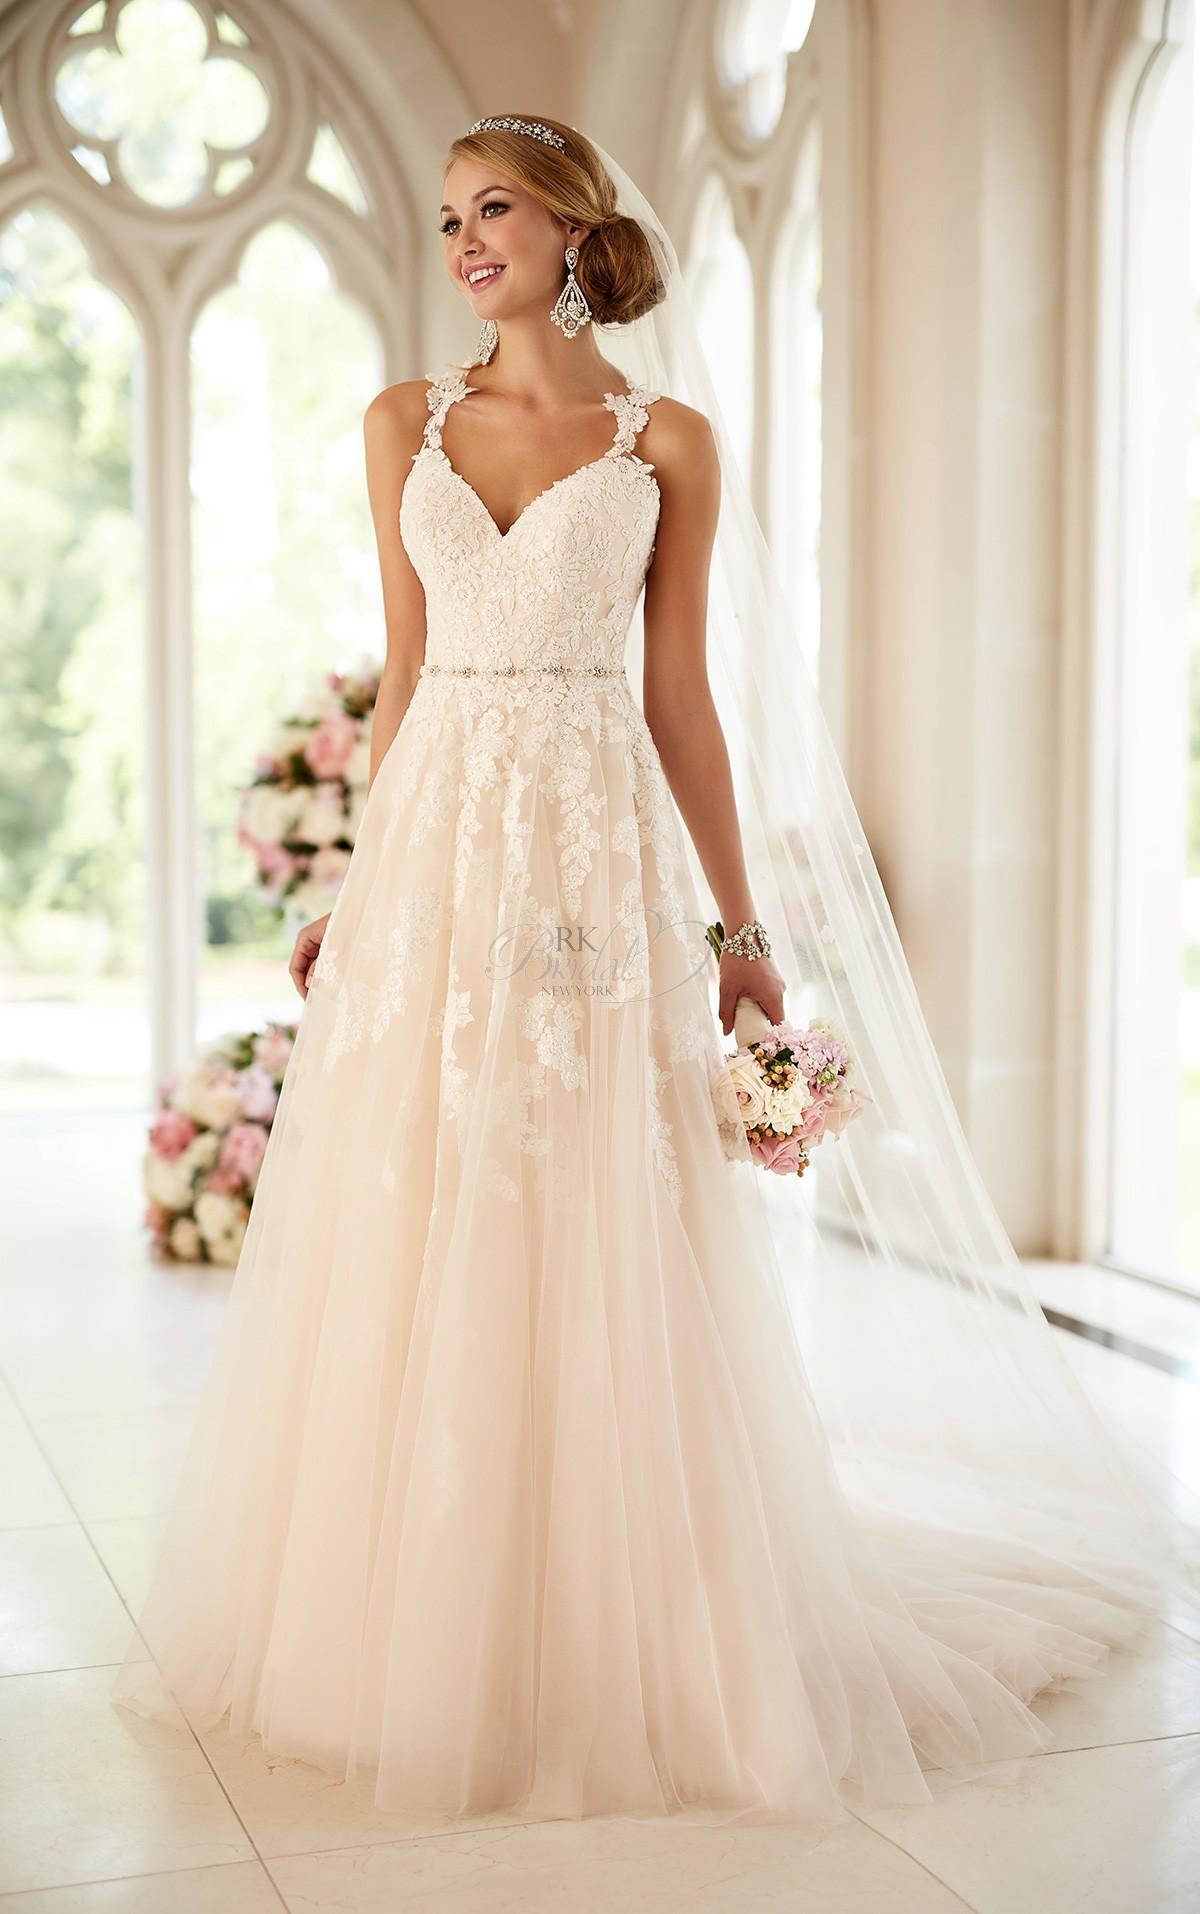 e96779d4ad4 Google Images Wedding Dresses